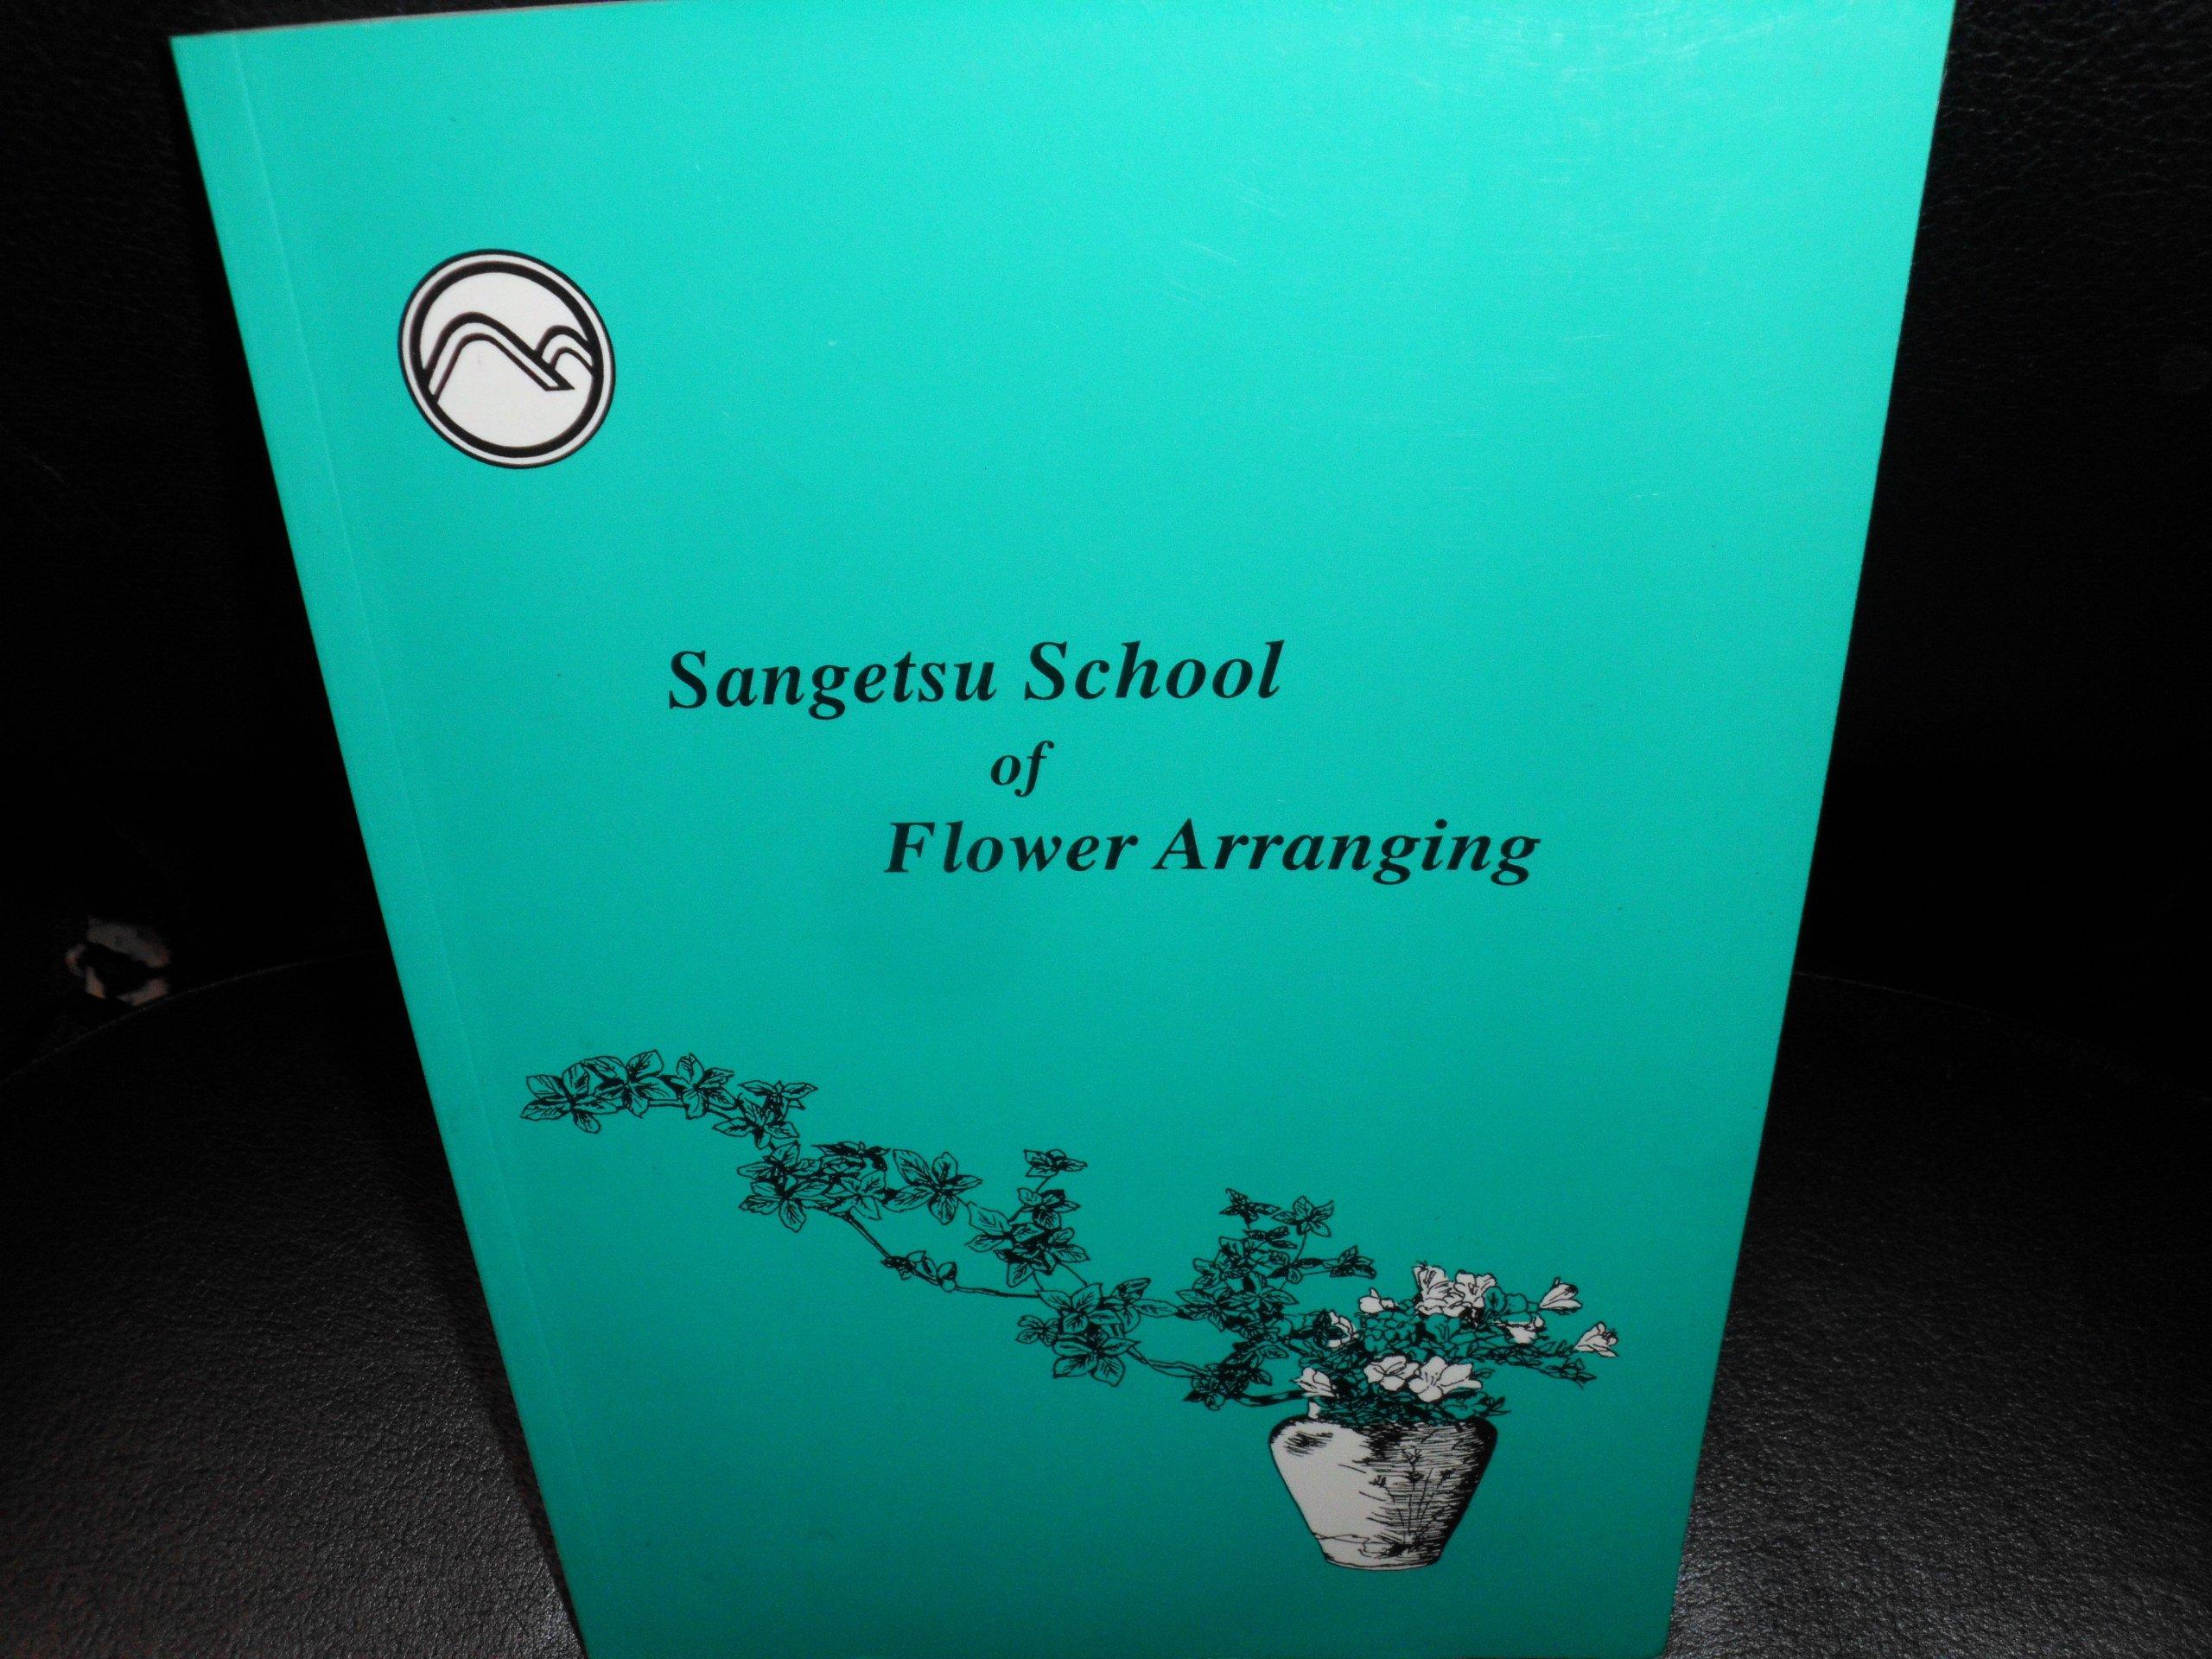 Sangetsu School of Flower Arranging: Beginning, Intermediate, and Advanced Study